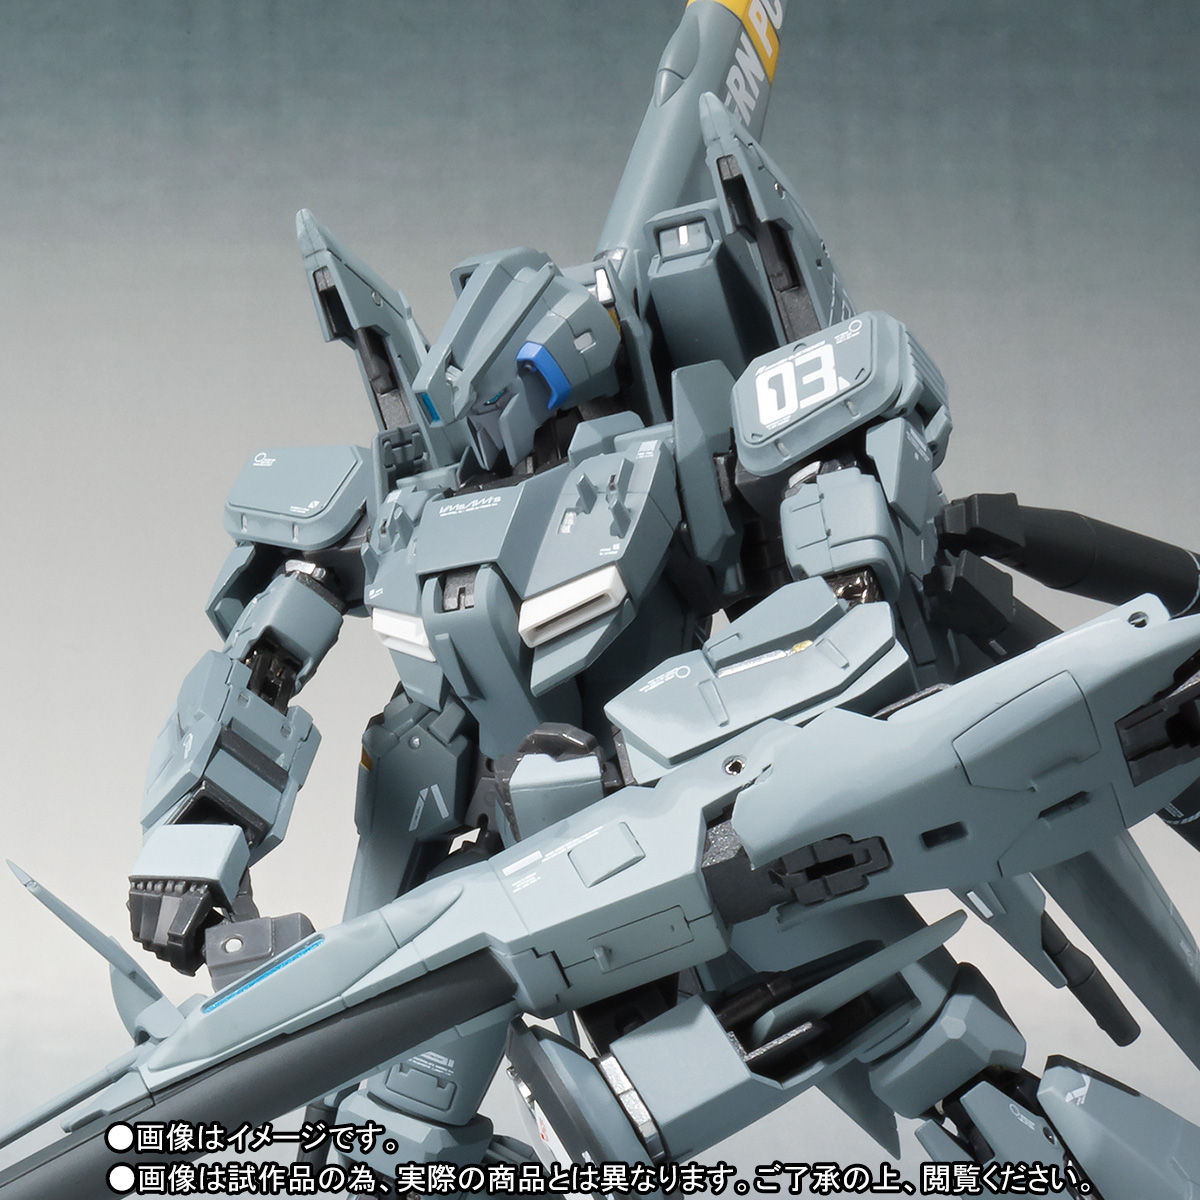 METAL ROBOT魂(Ka signature)<SIDE MS>『ゼータプラス C1(03 シグマン機)』可動フィギュア-001